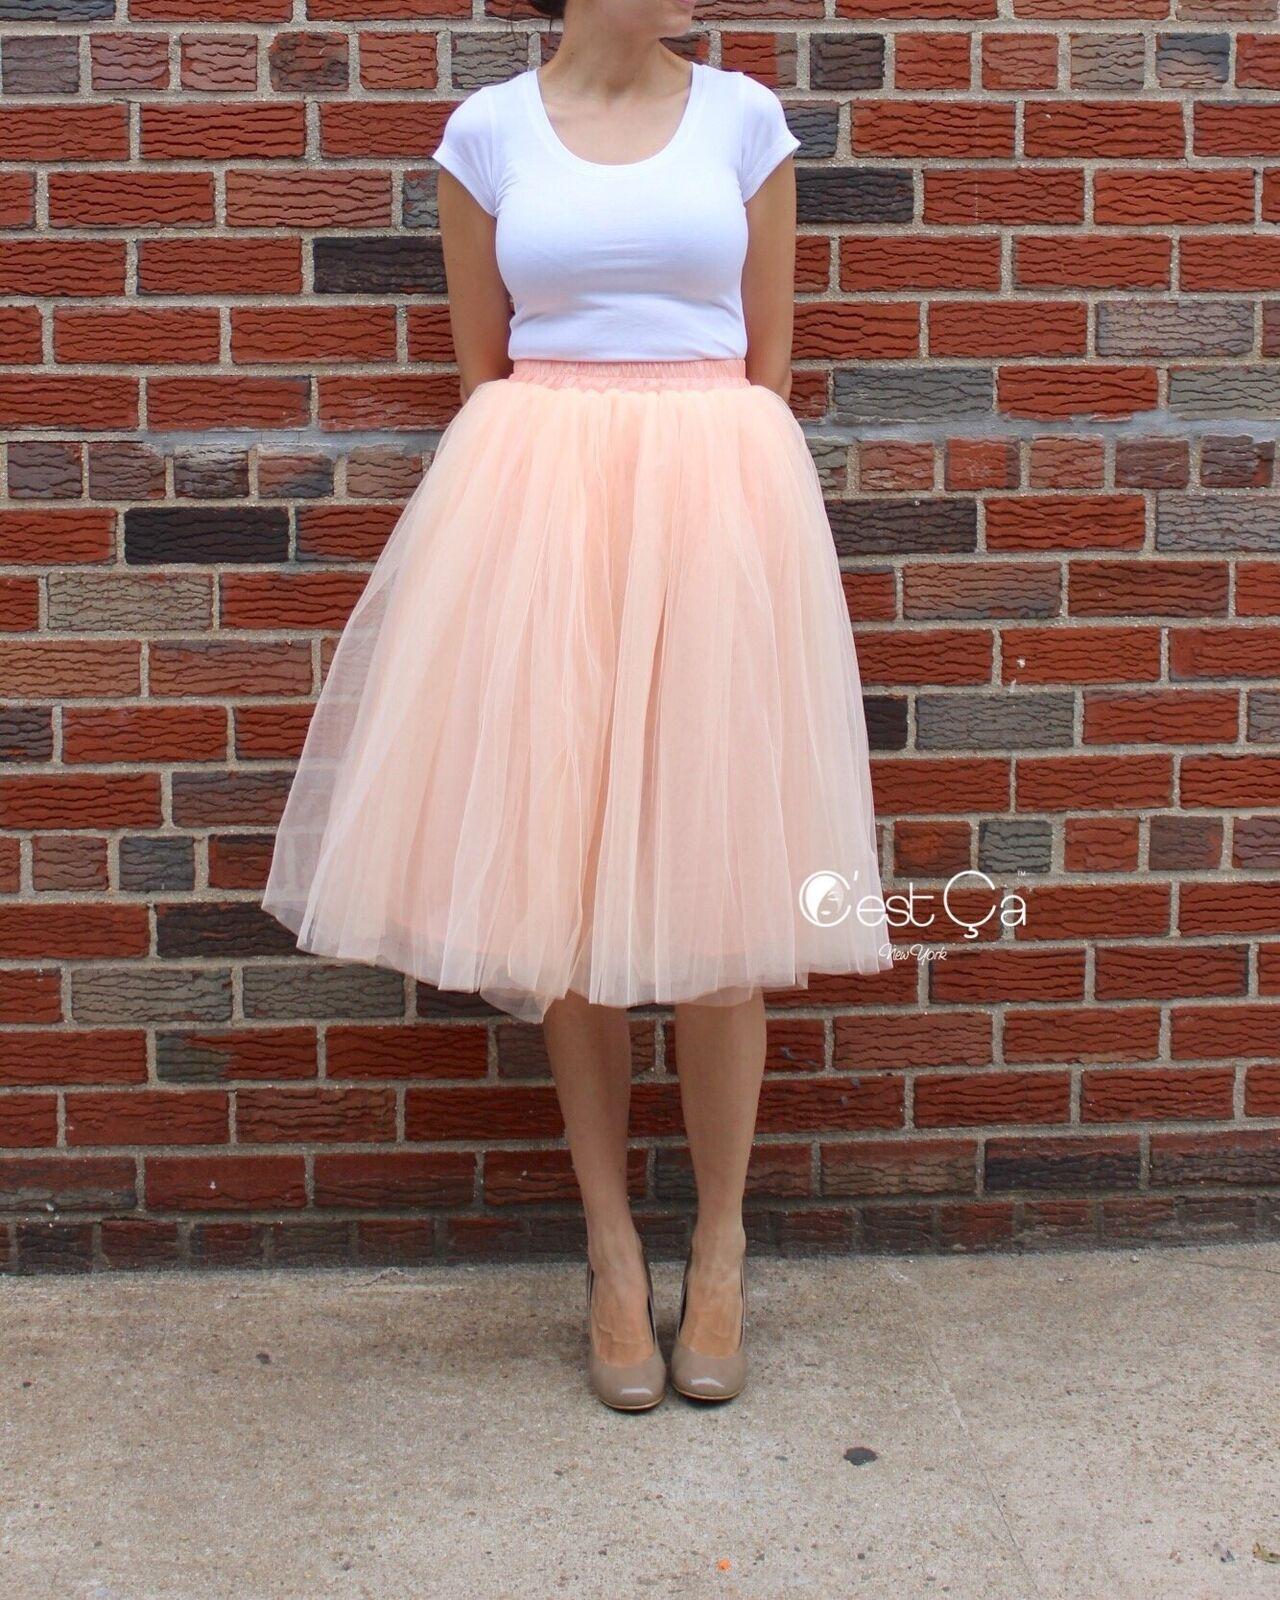 Claire bluesh Peach Soft Tulle Skirt - Below Knee Midi